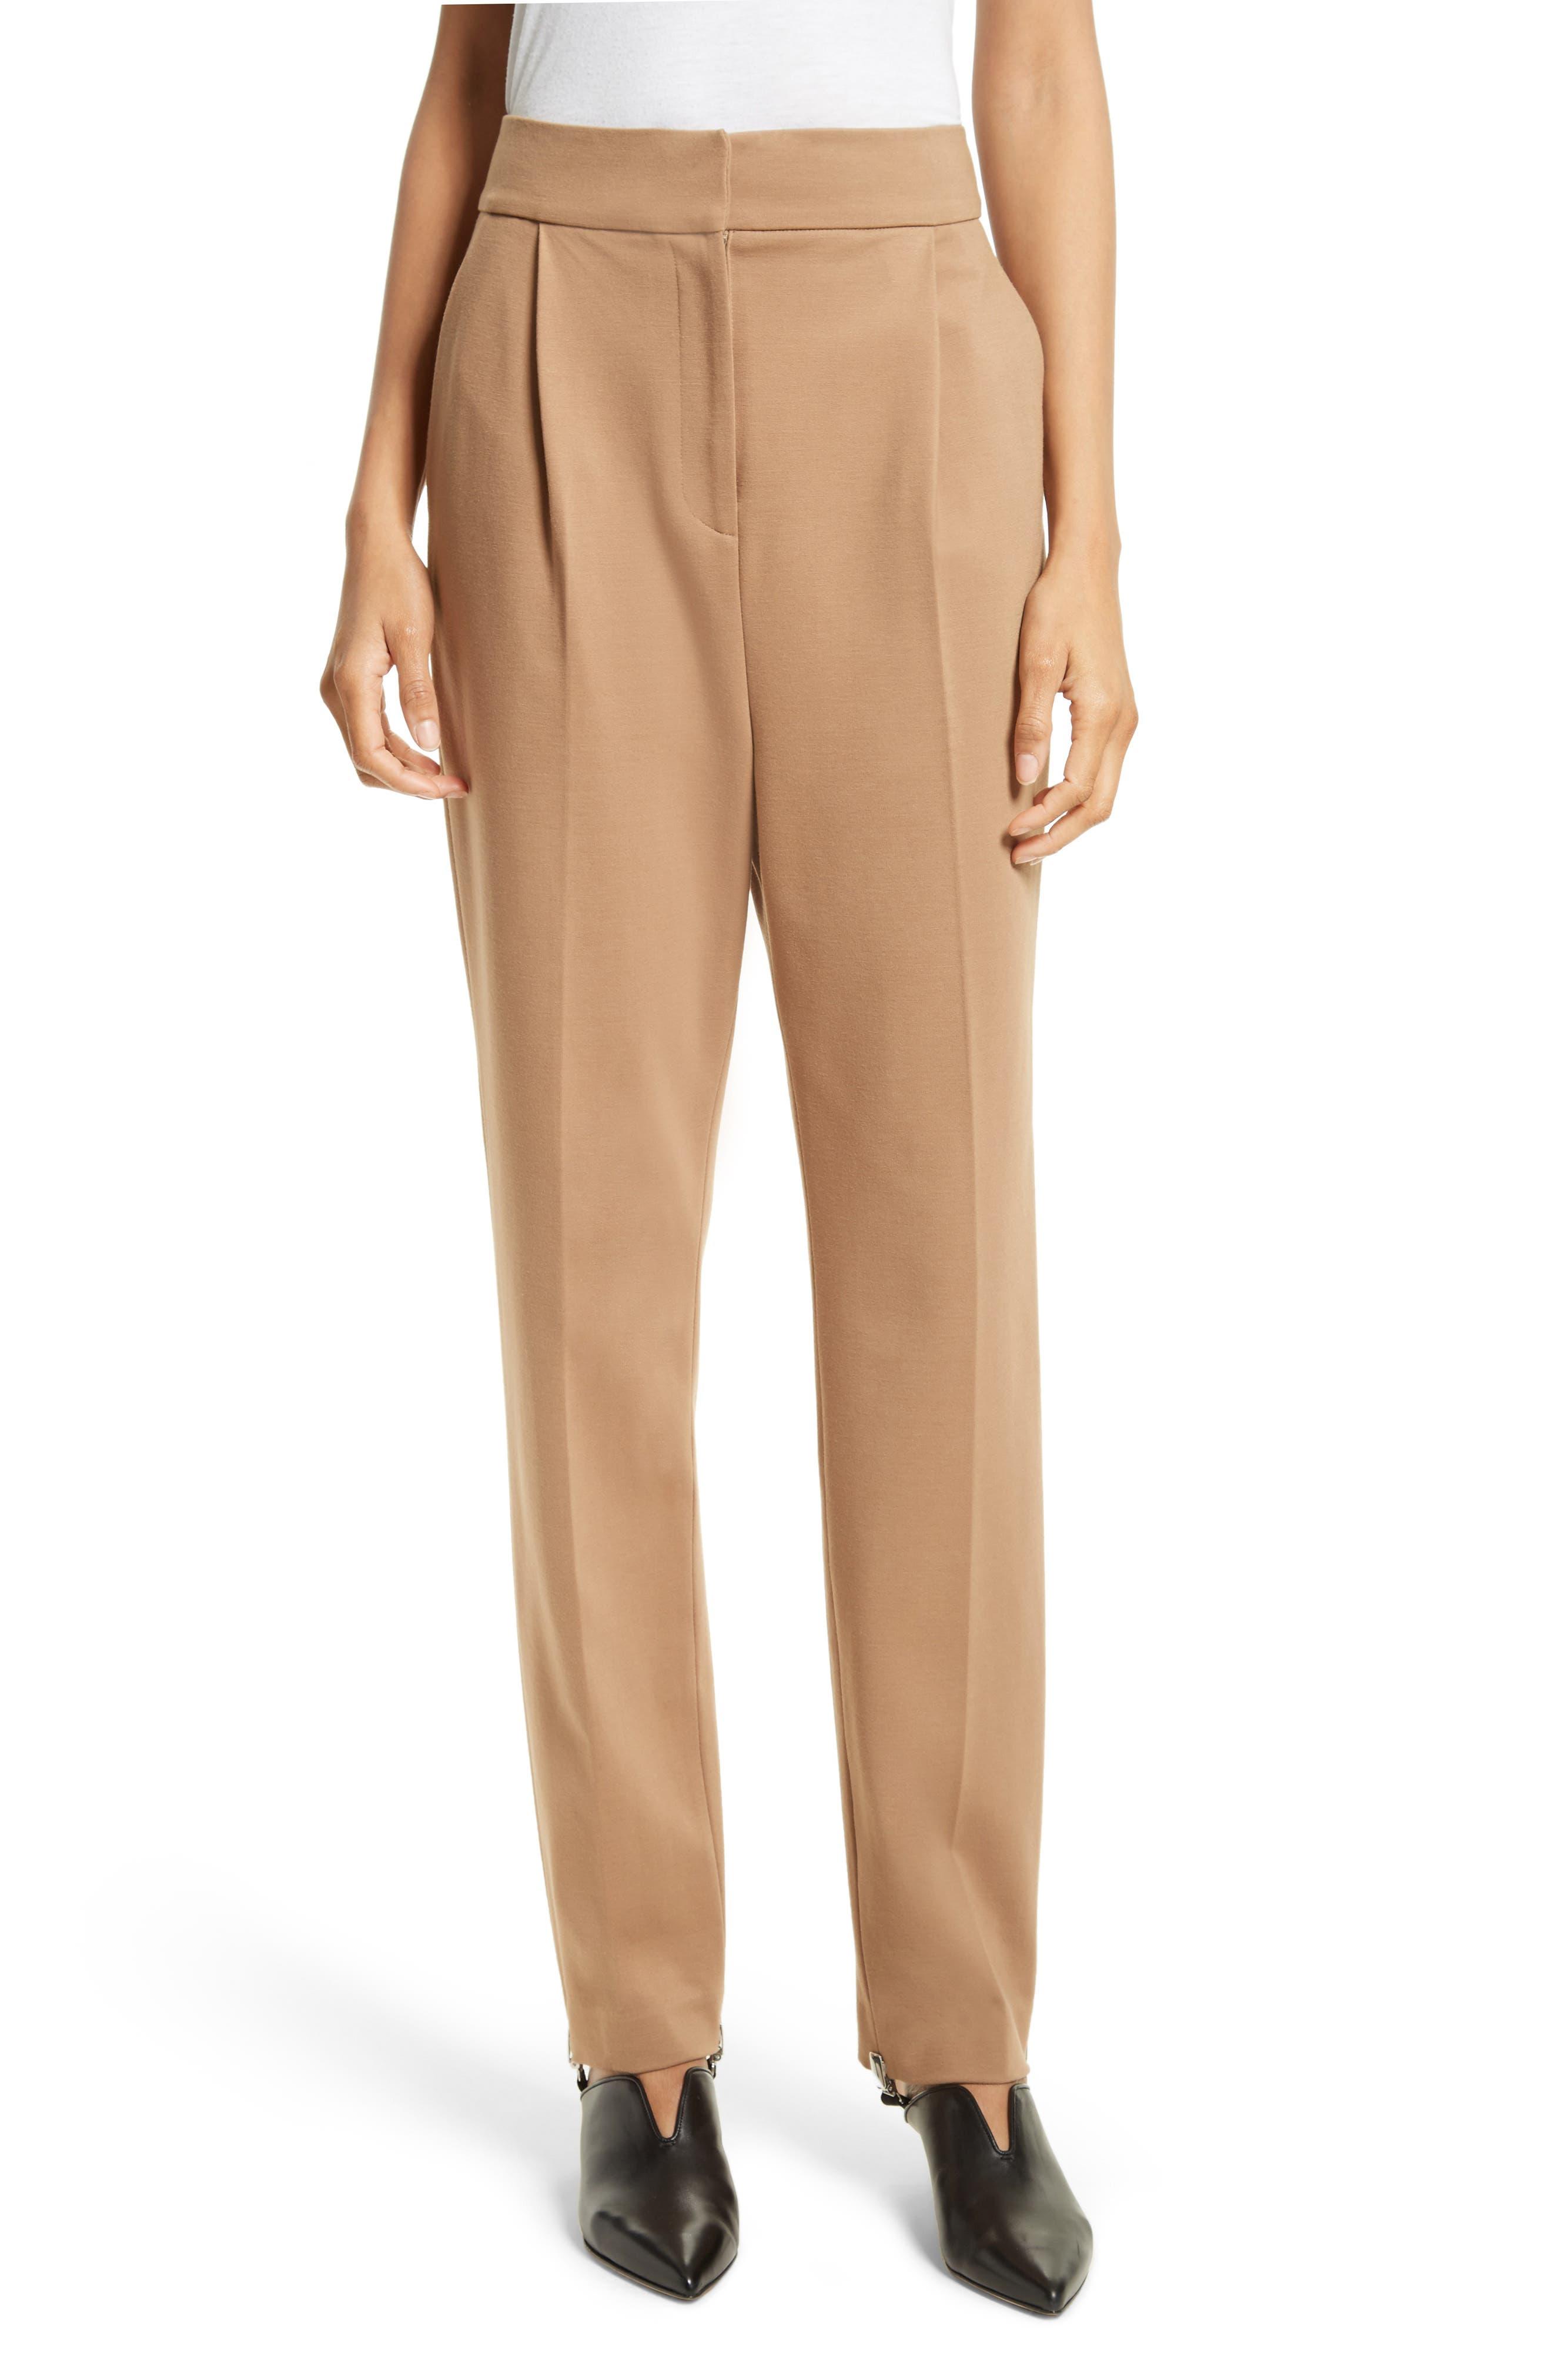 Alternate Image 1 Selected - Tibi Bond Stretch Stirrup Pants